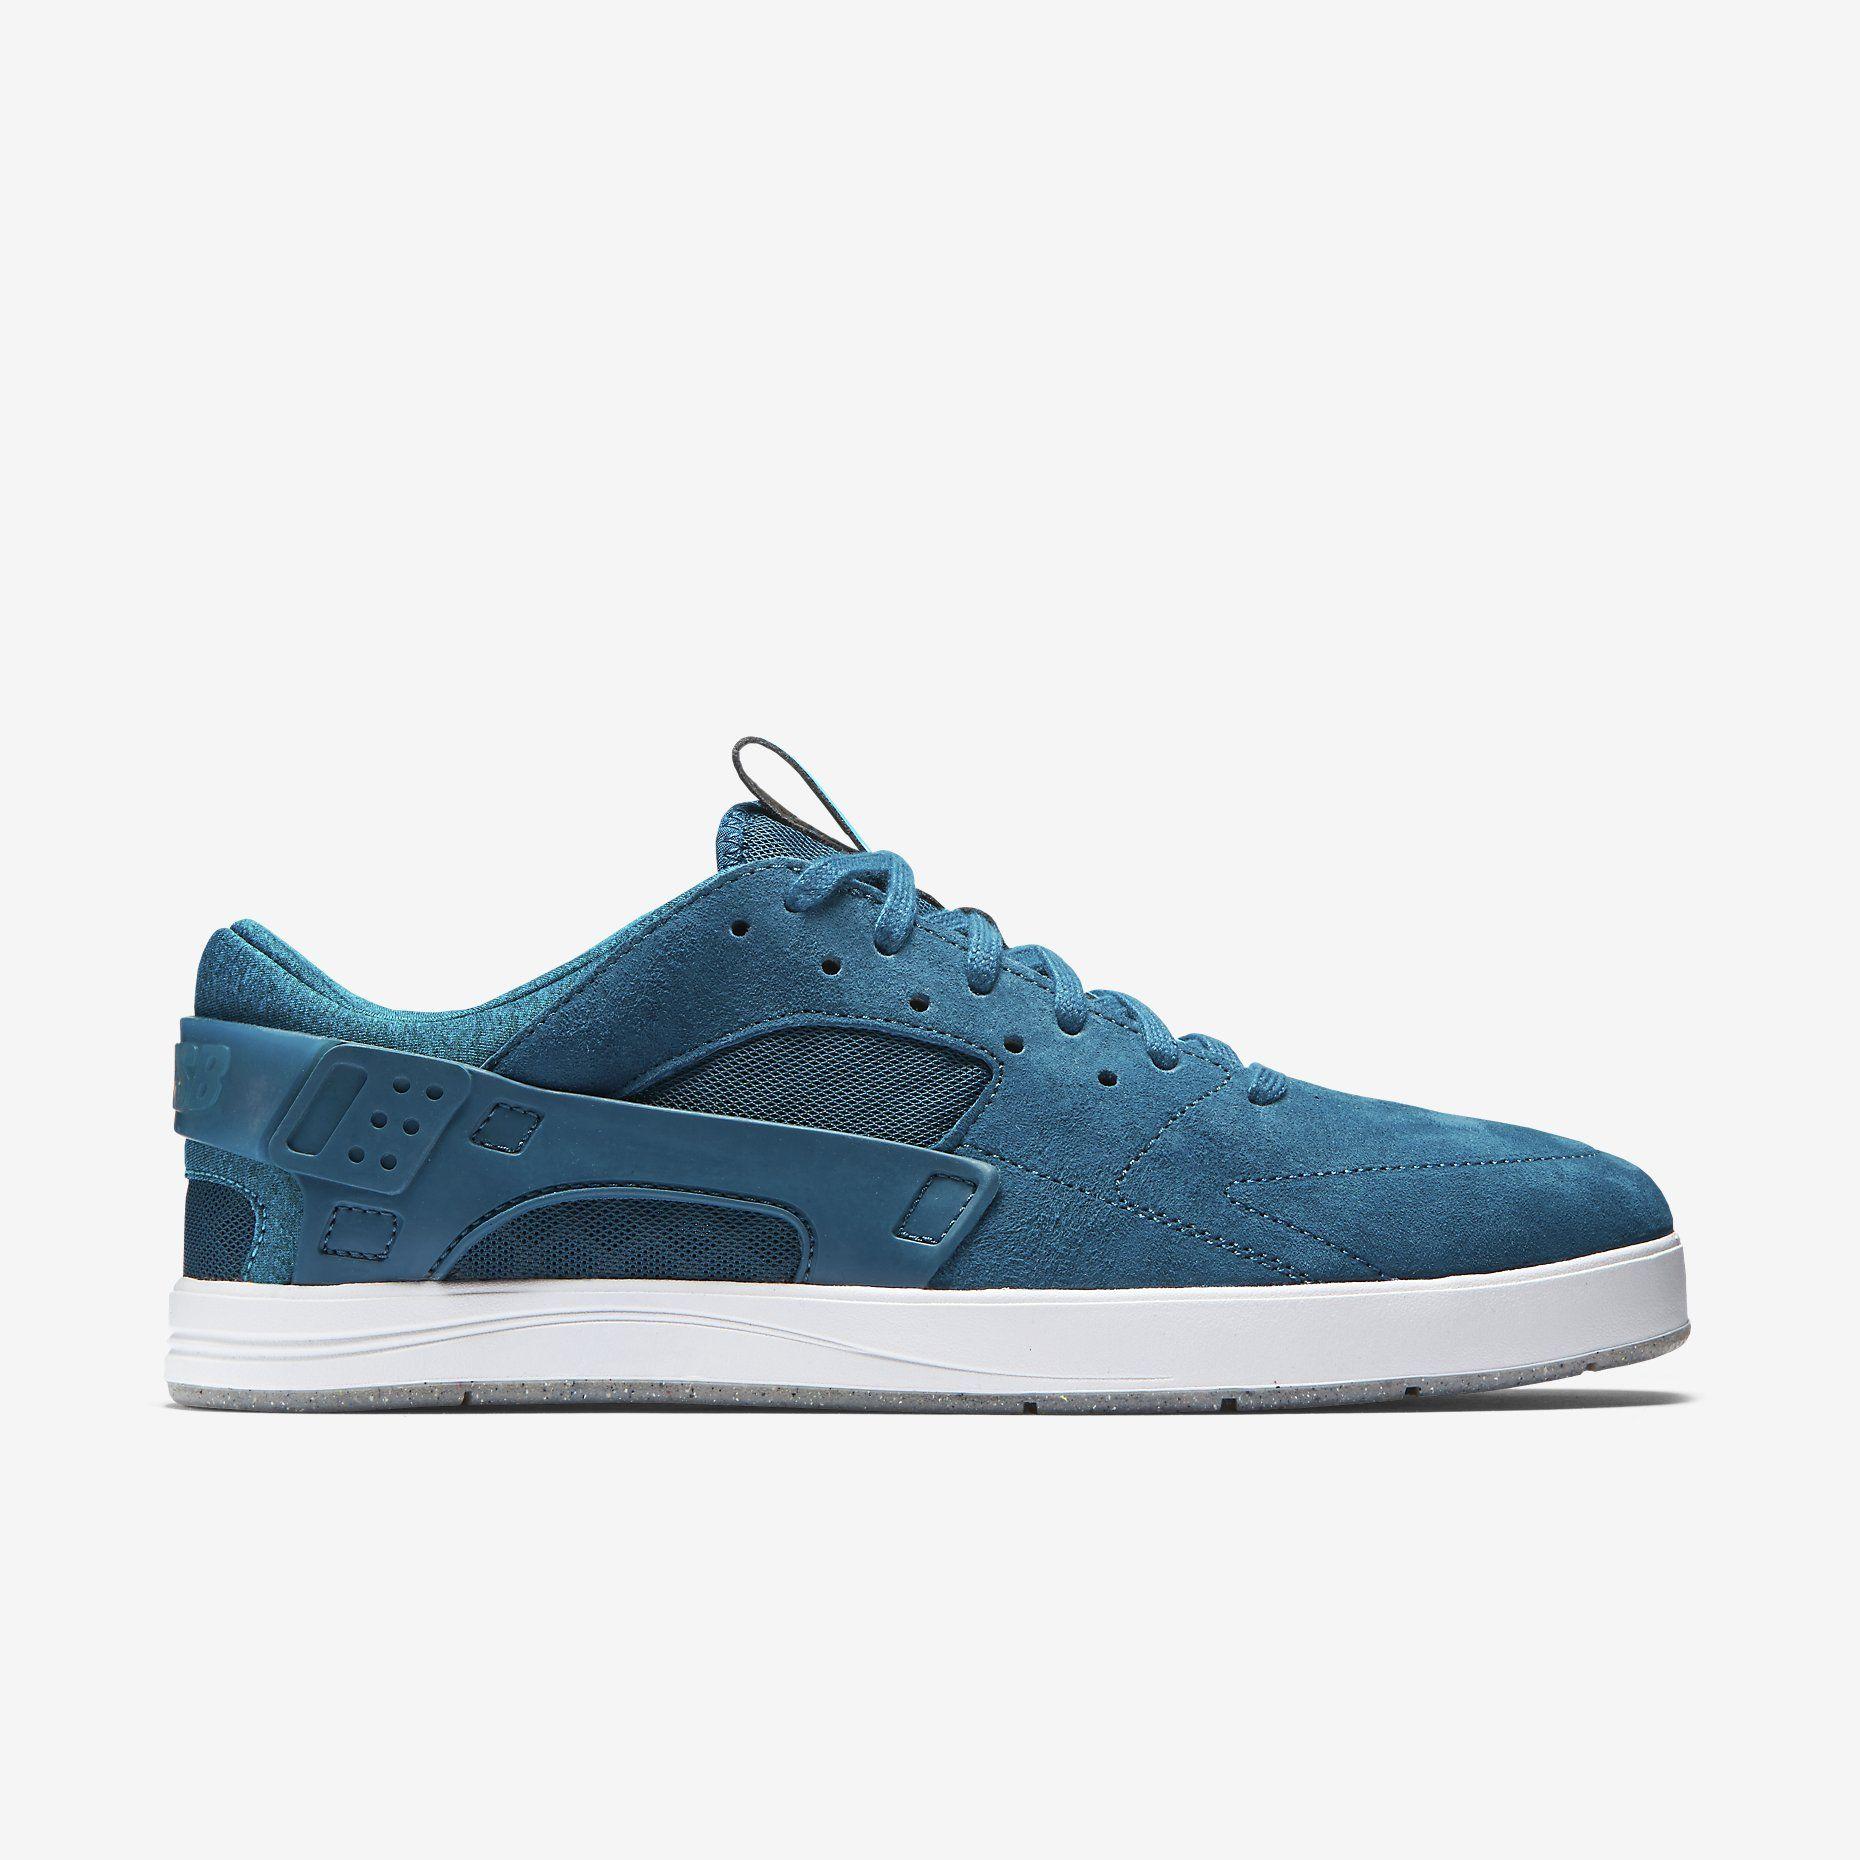 on sale b94af 772f8 Scarpa da skateboard Nike SB Eric Koston Huarache - Uomo. Nike Store IT